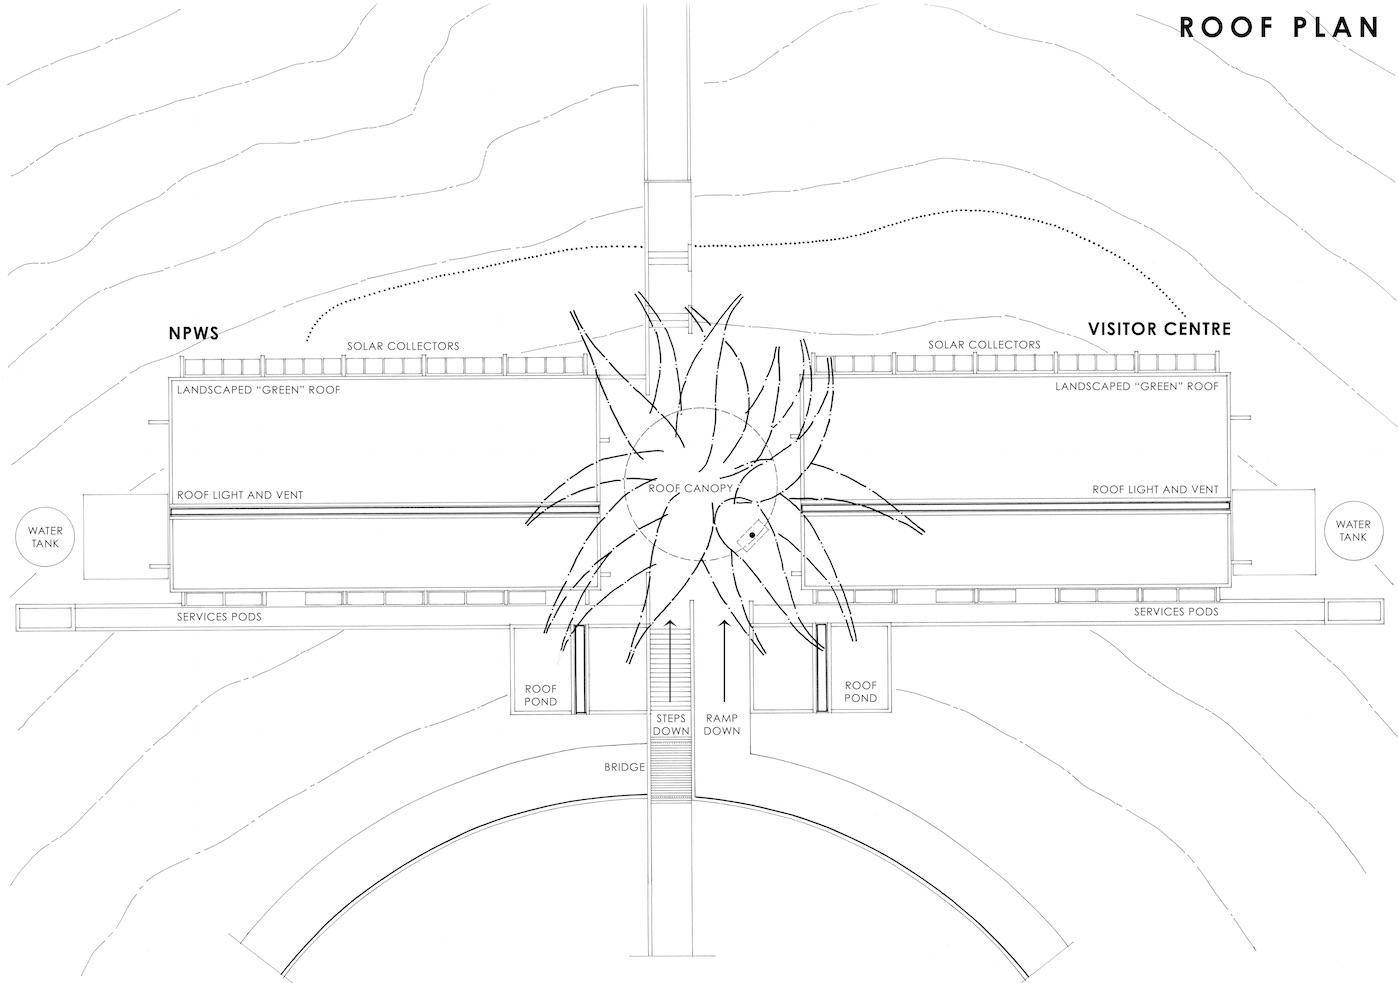 Roof Plan copy.jpg